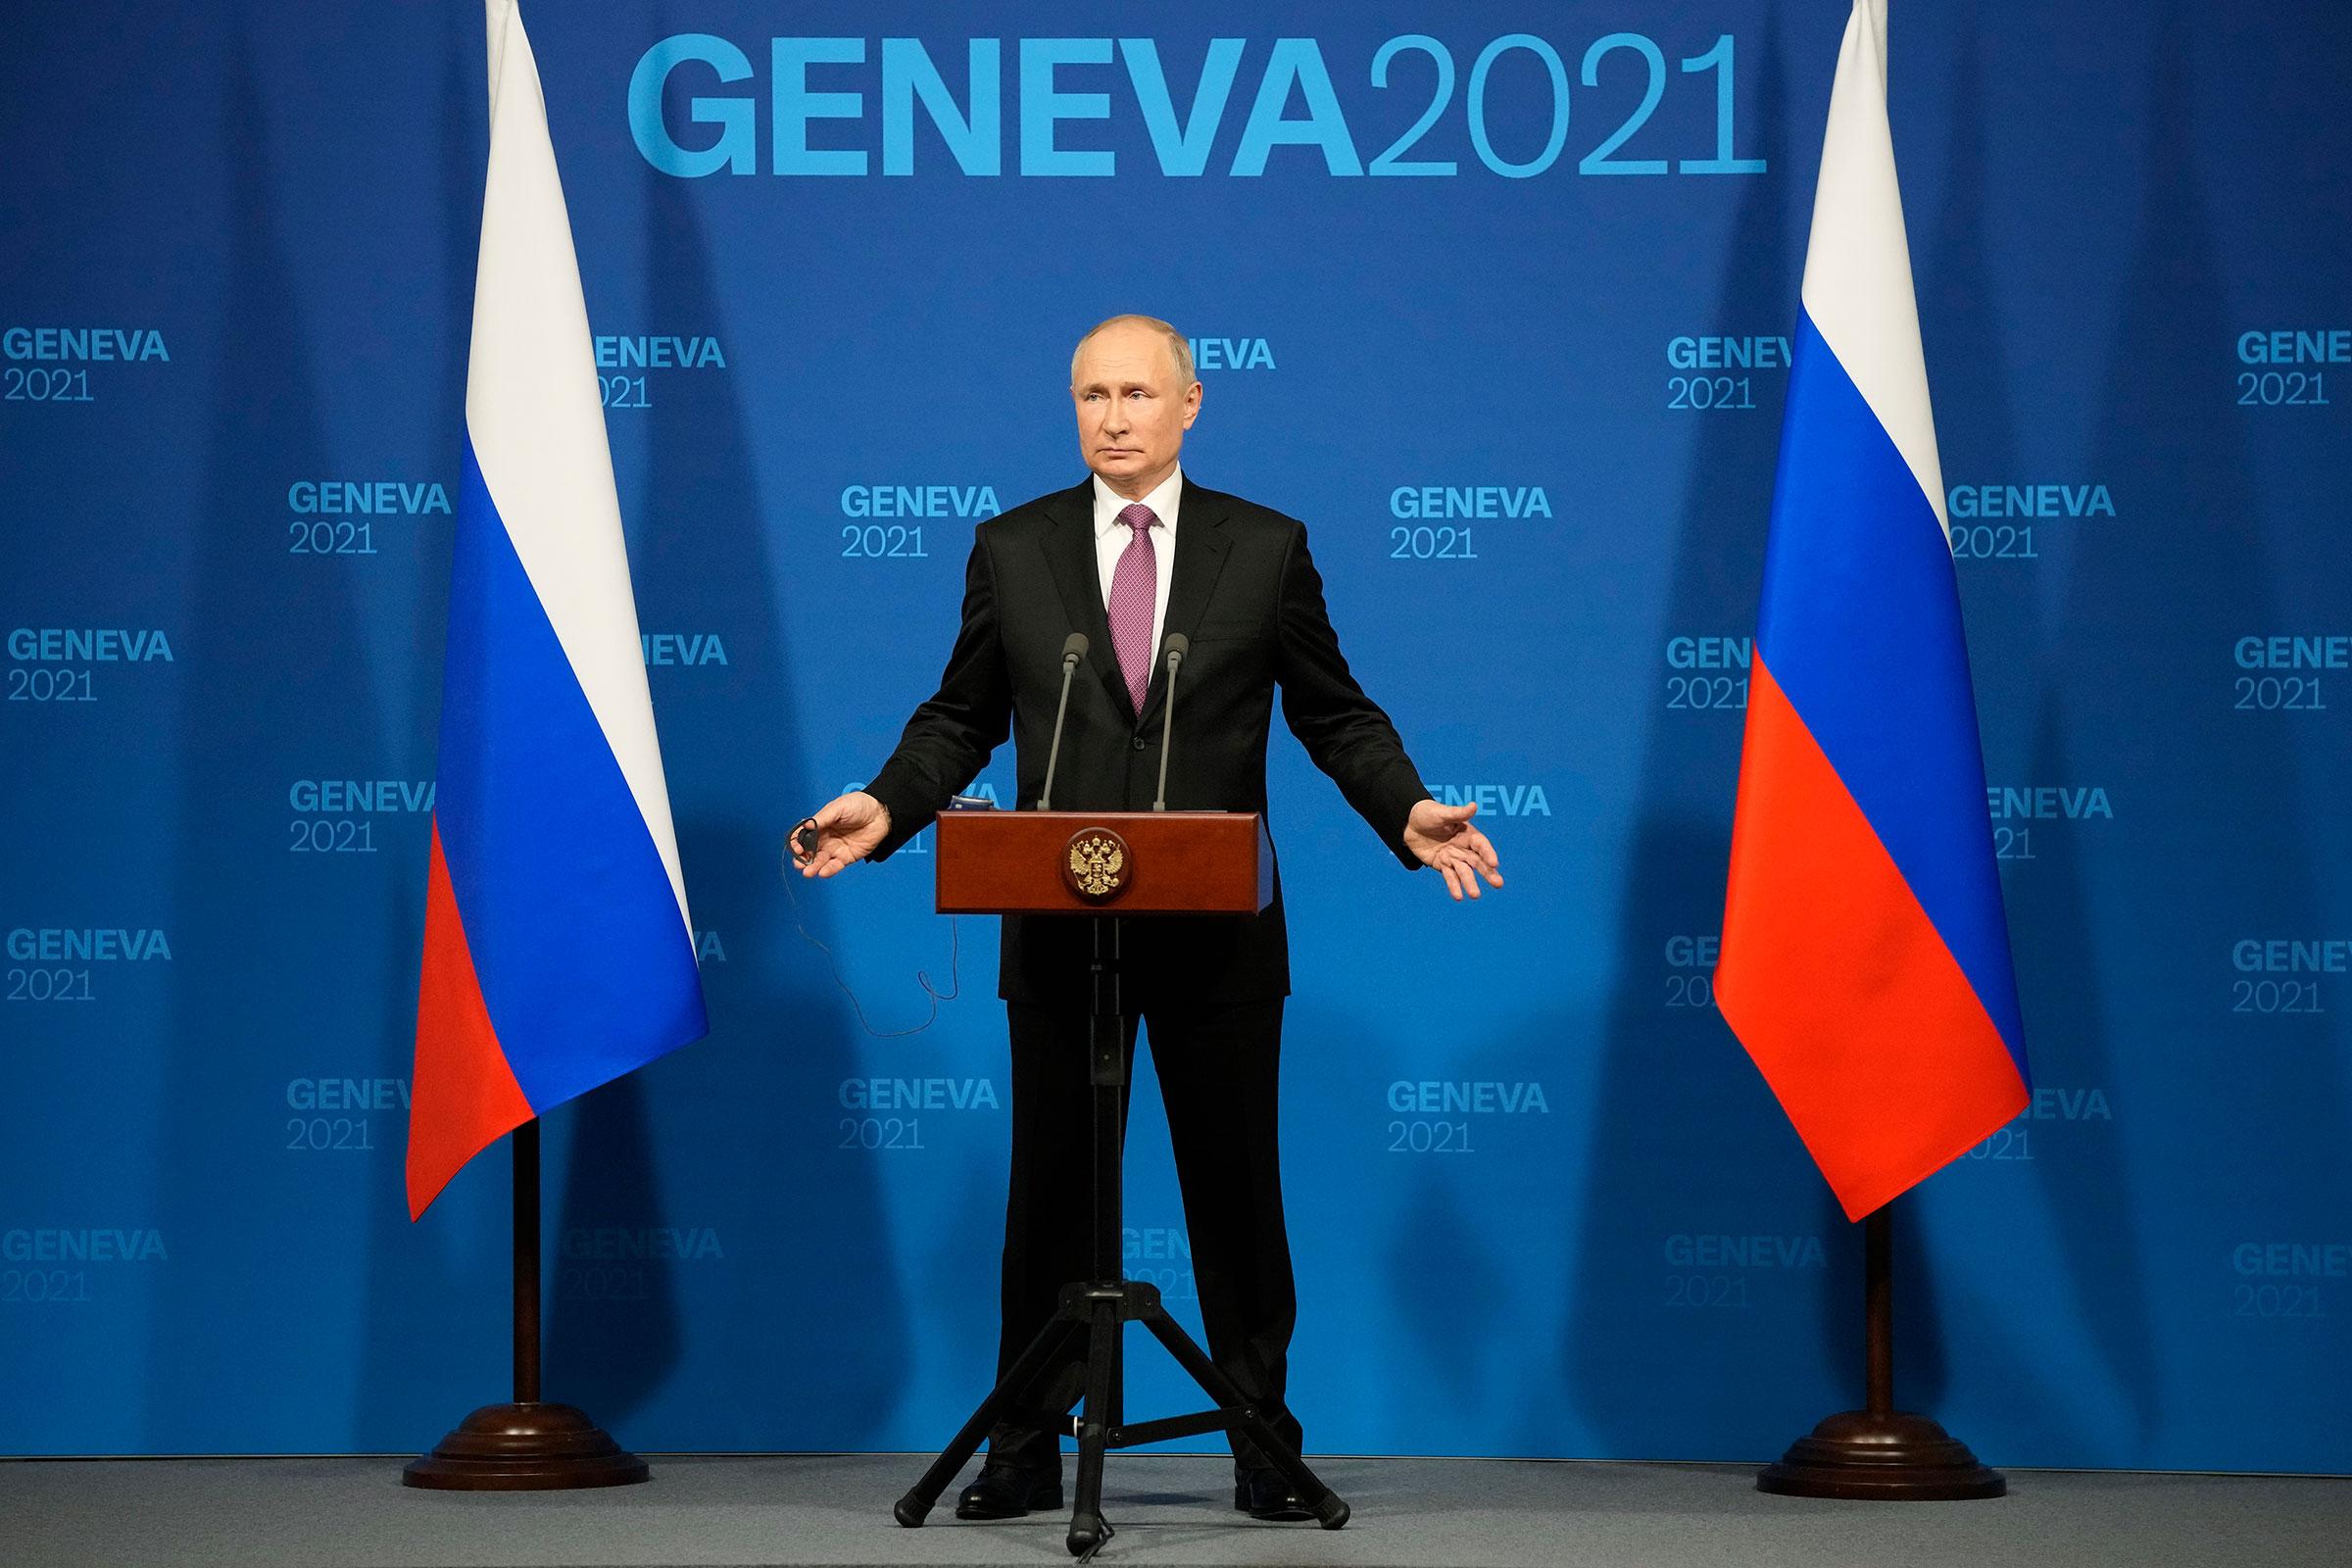 Russian President Vladimir Putin speaks during a news conference after his meeting with U.S. President Joe Biden in Geneva, Switzerland on June 16, 2021.